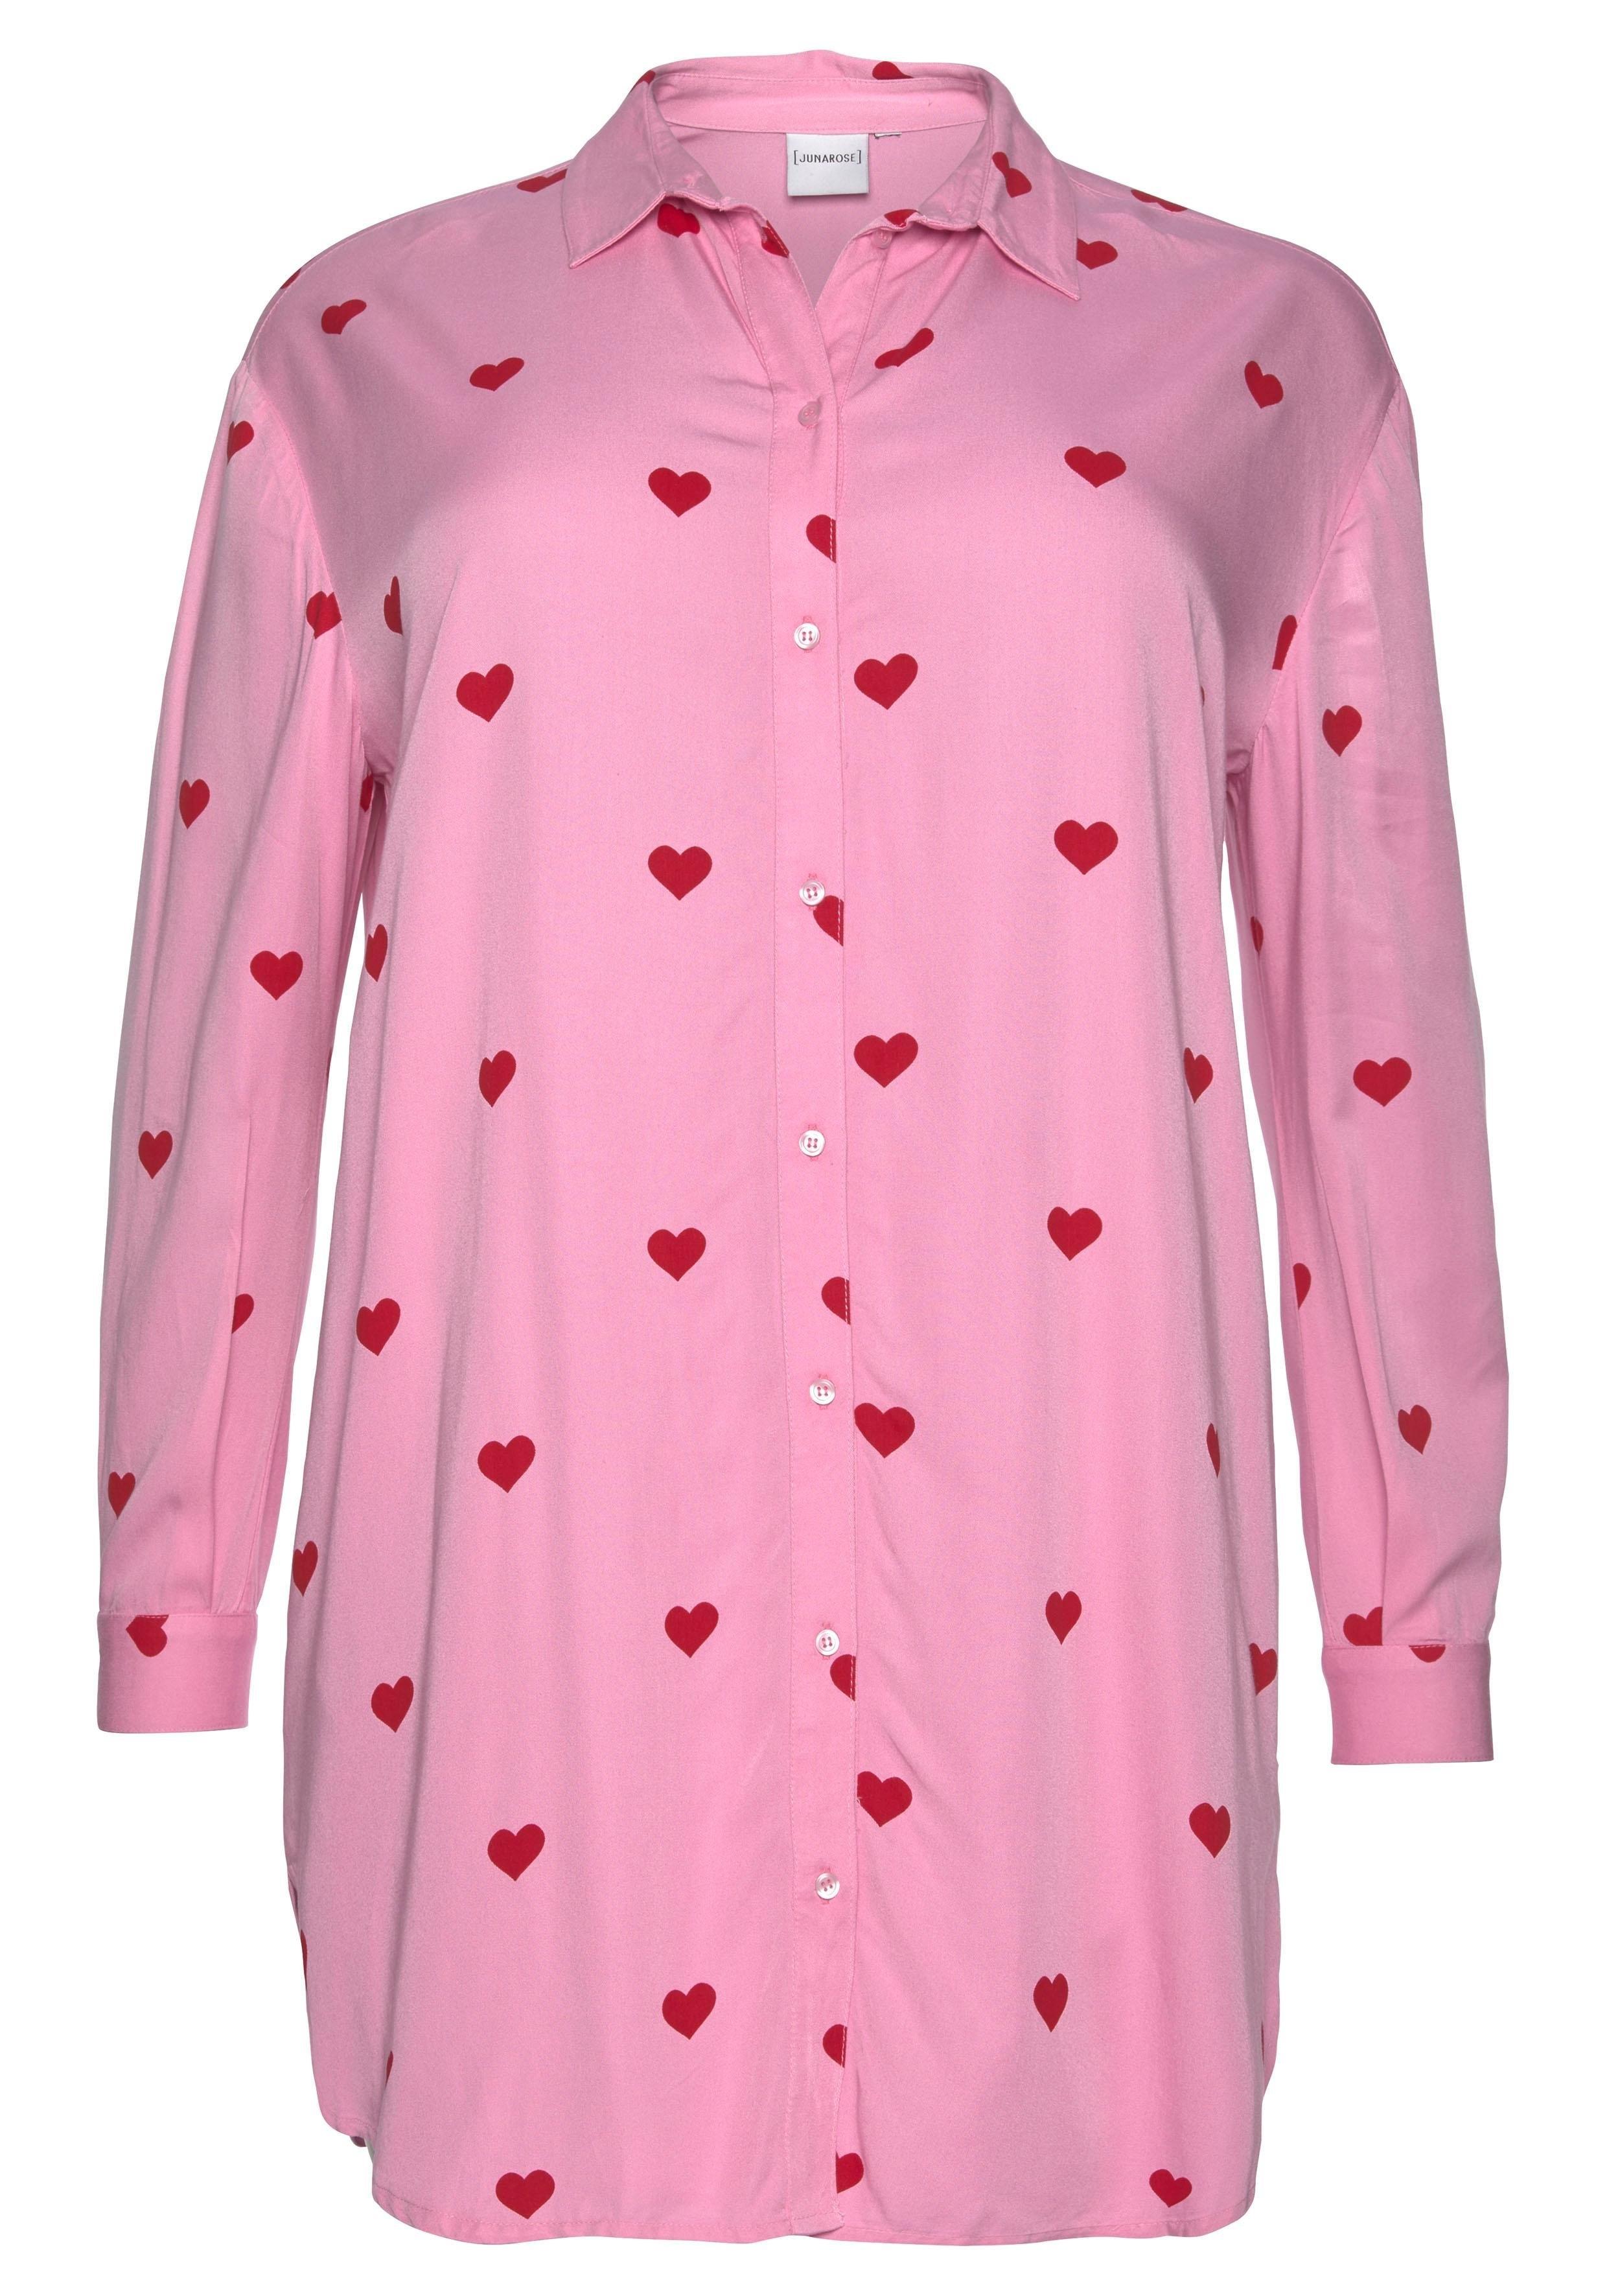 0fb4da8f146628 Junarose lange blouse online bestellen